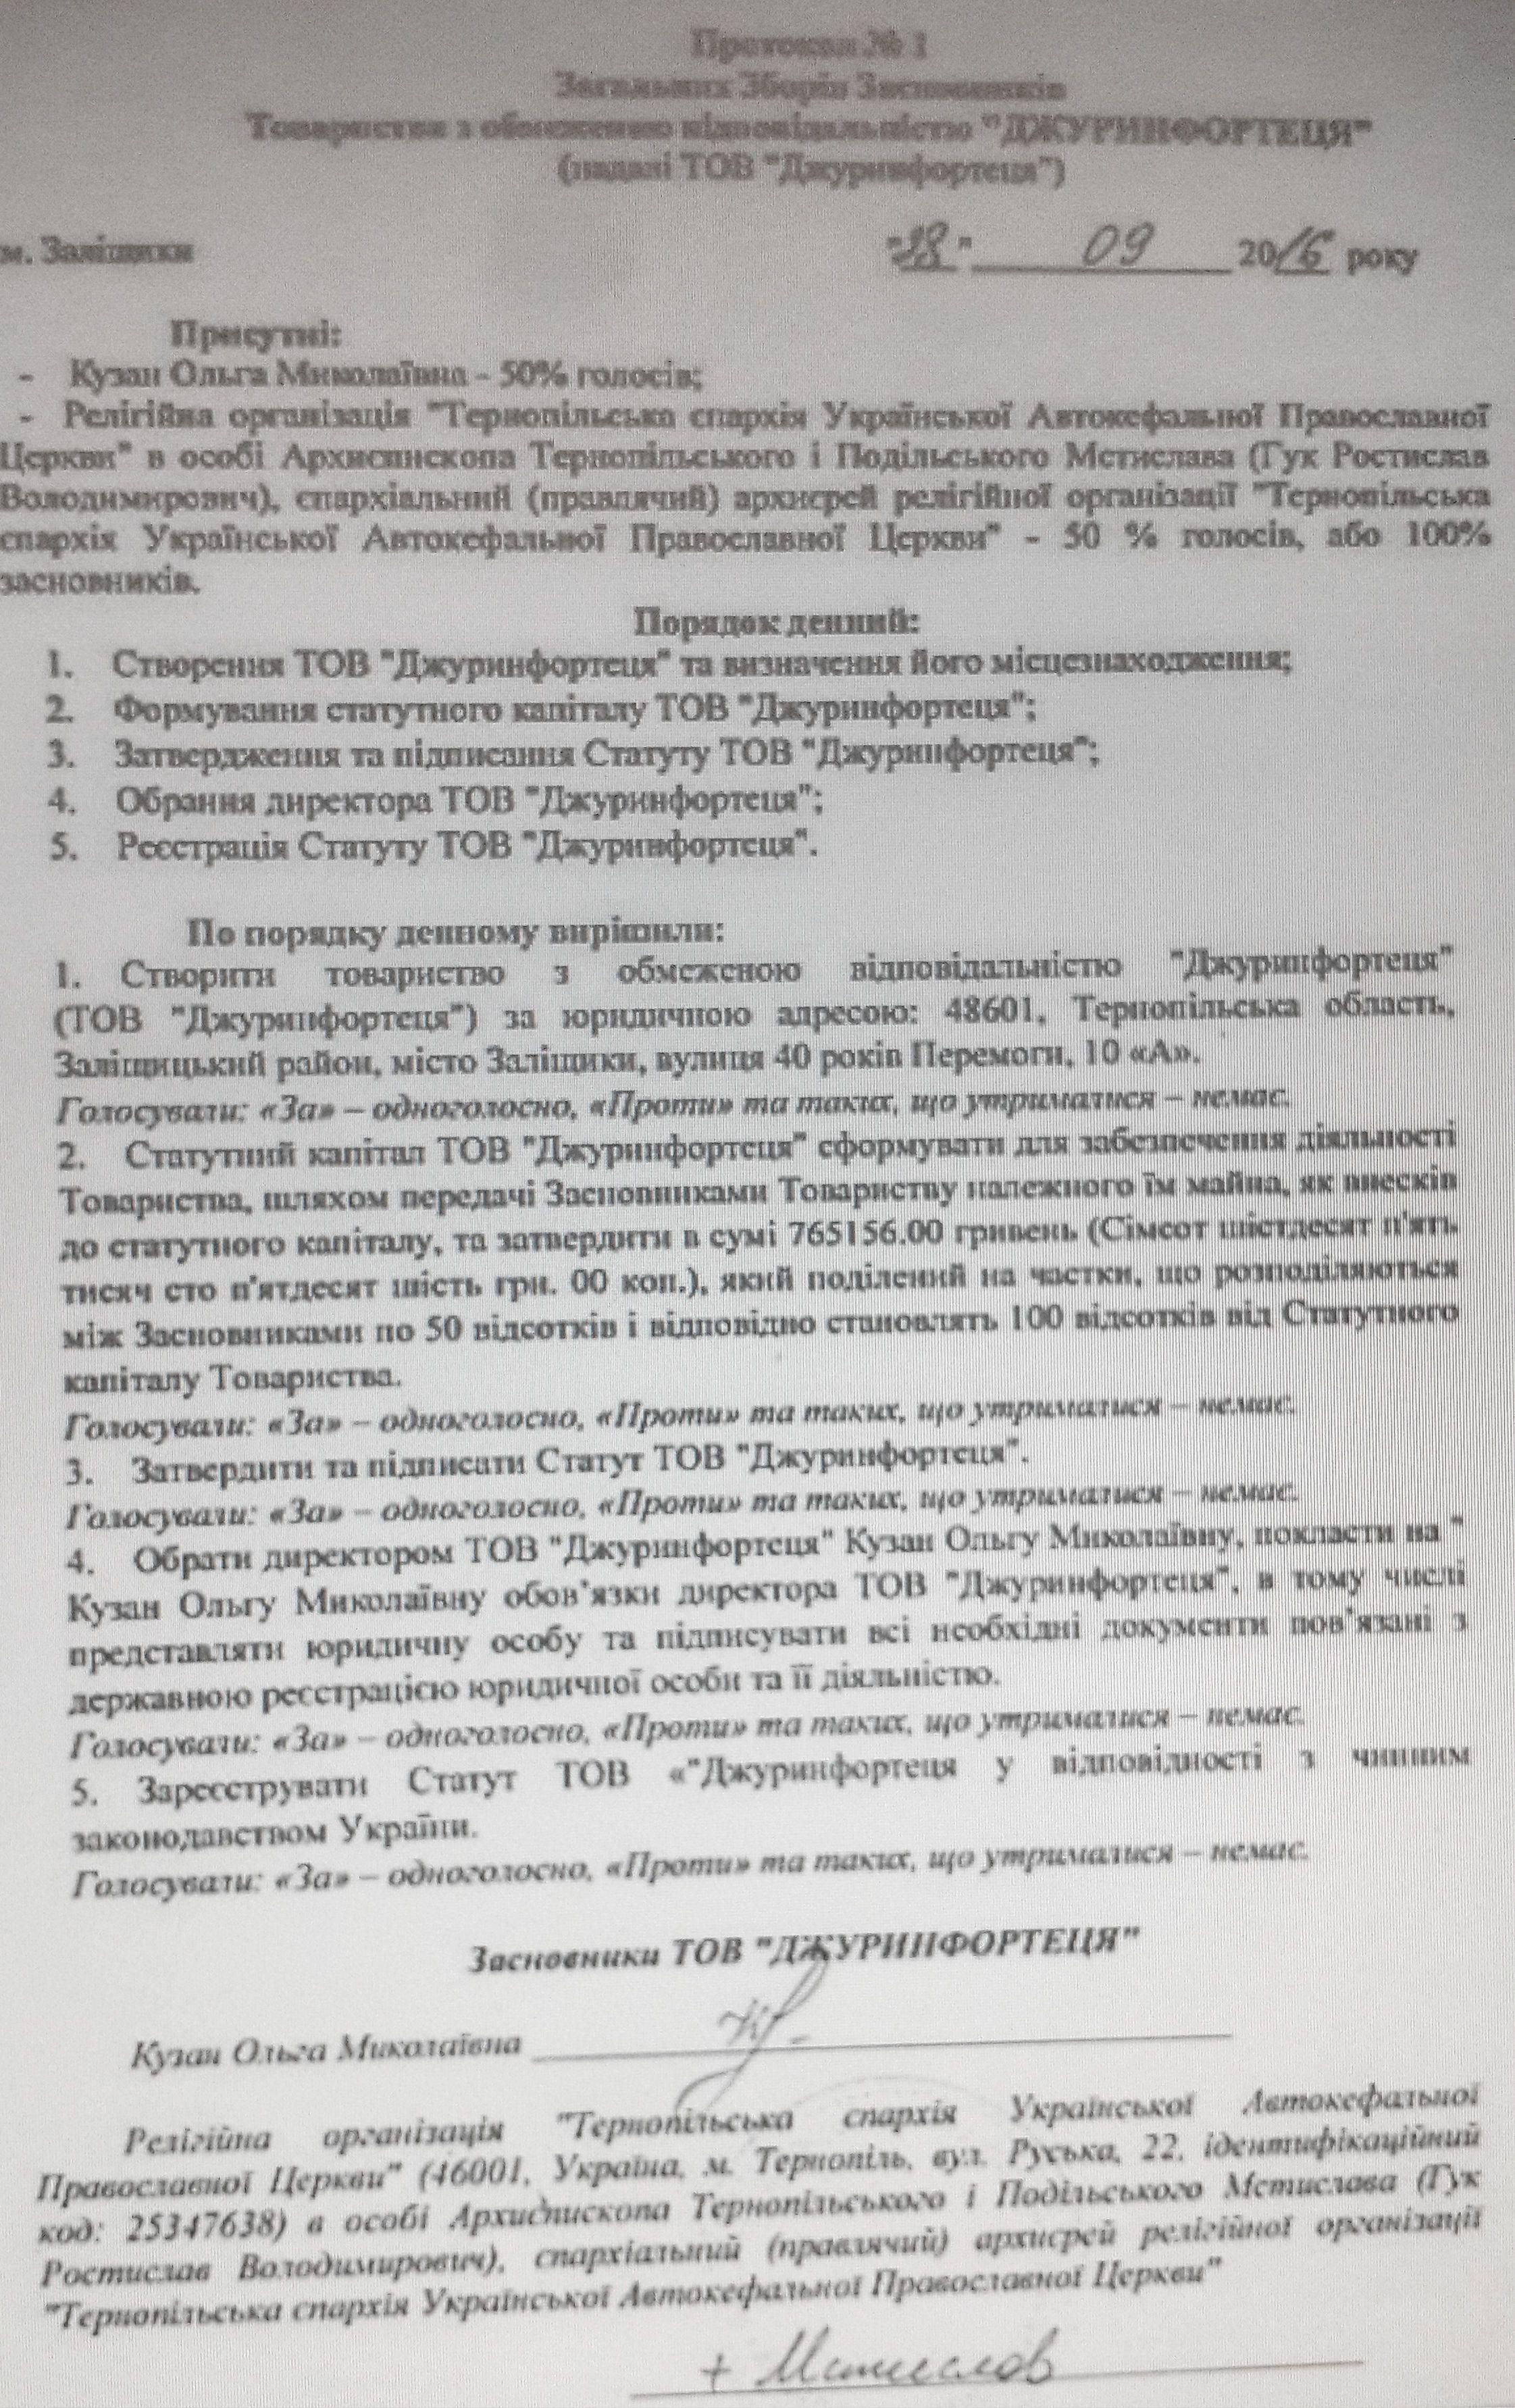 Документи по священику Мстиславу_7